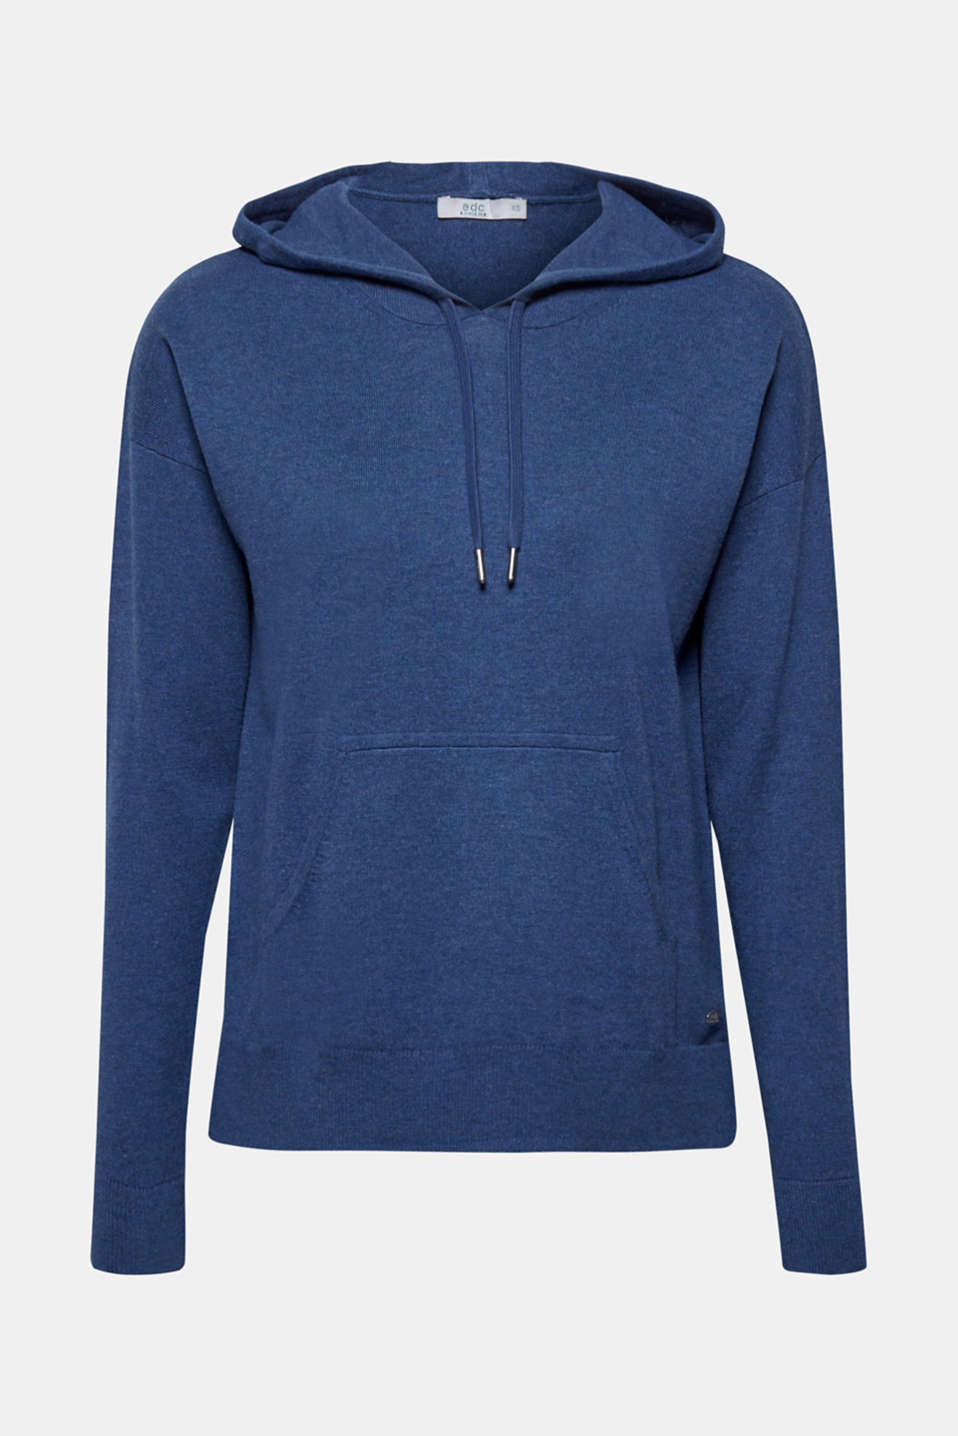 Sweaters, DARK BLUE 5, detail image number 5